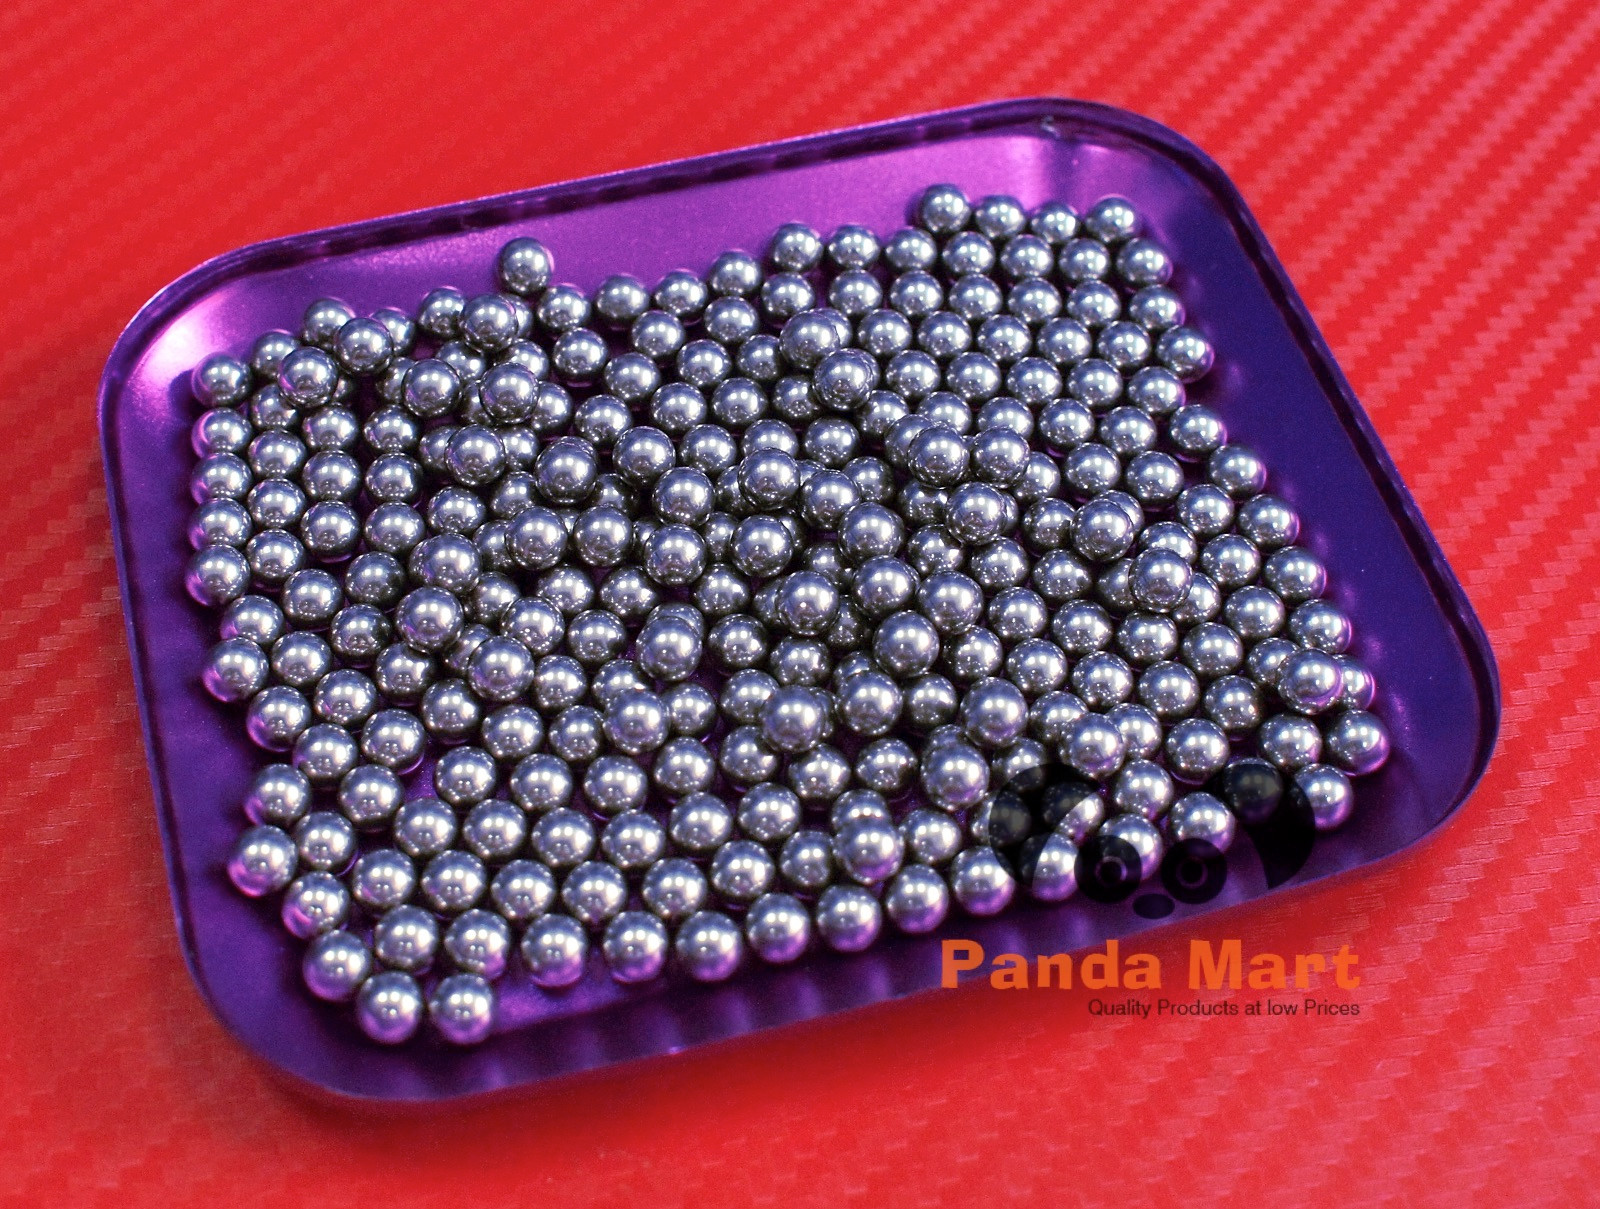 G10 Hardened Chrome Steel Loose Bearings Ball Bearing Balls 6.5mm 250 PCS